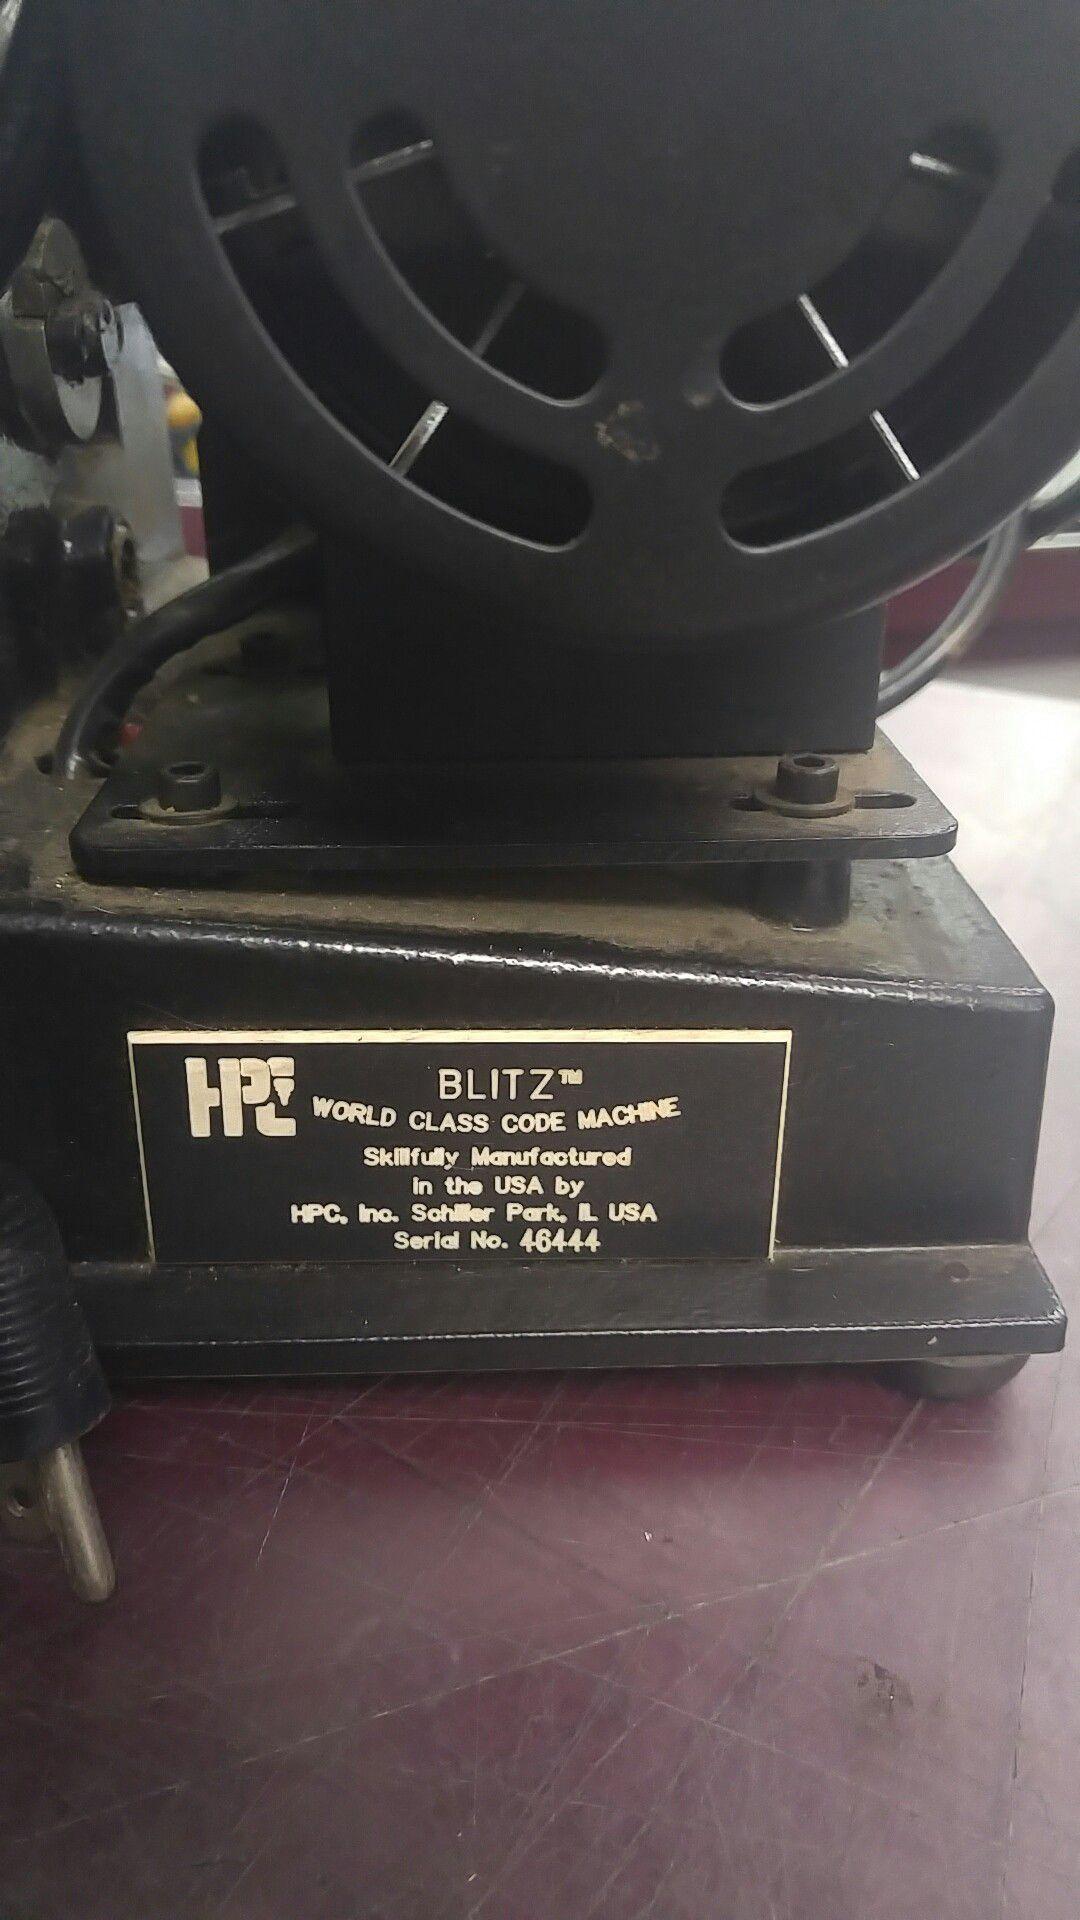 HPC key cutter